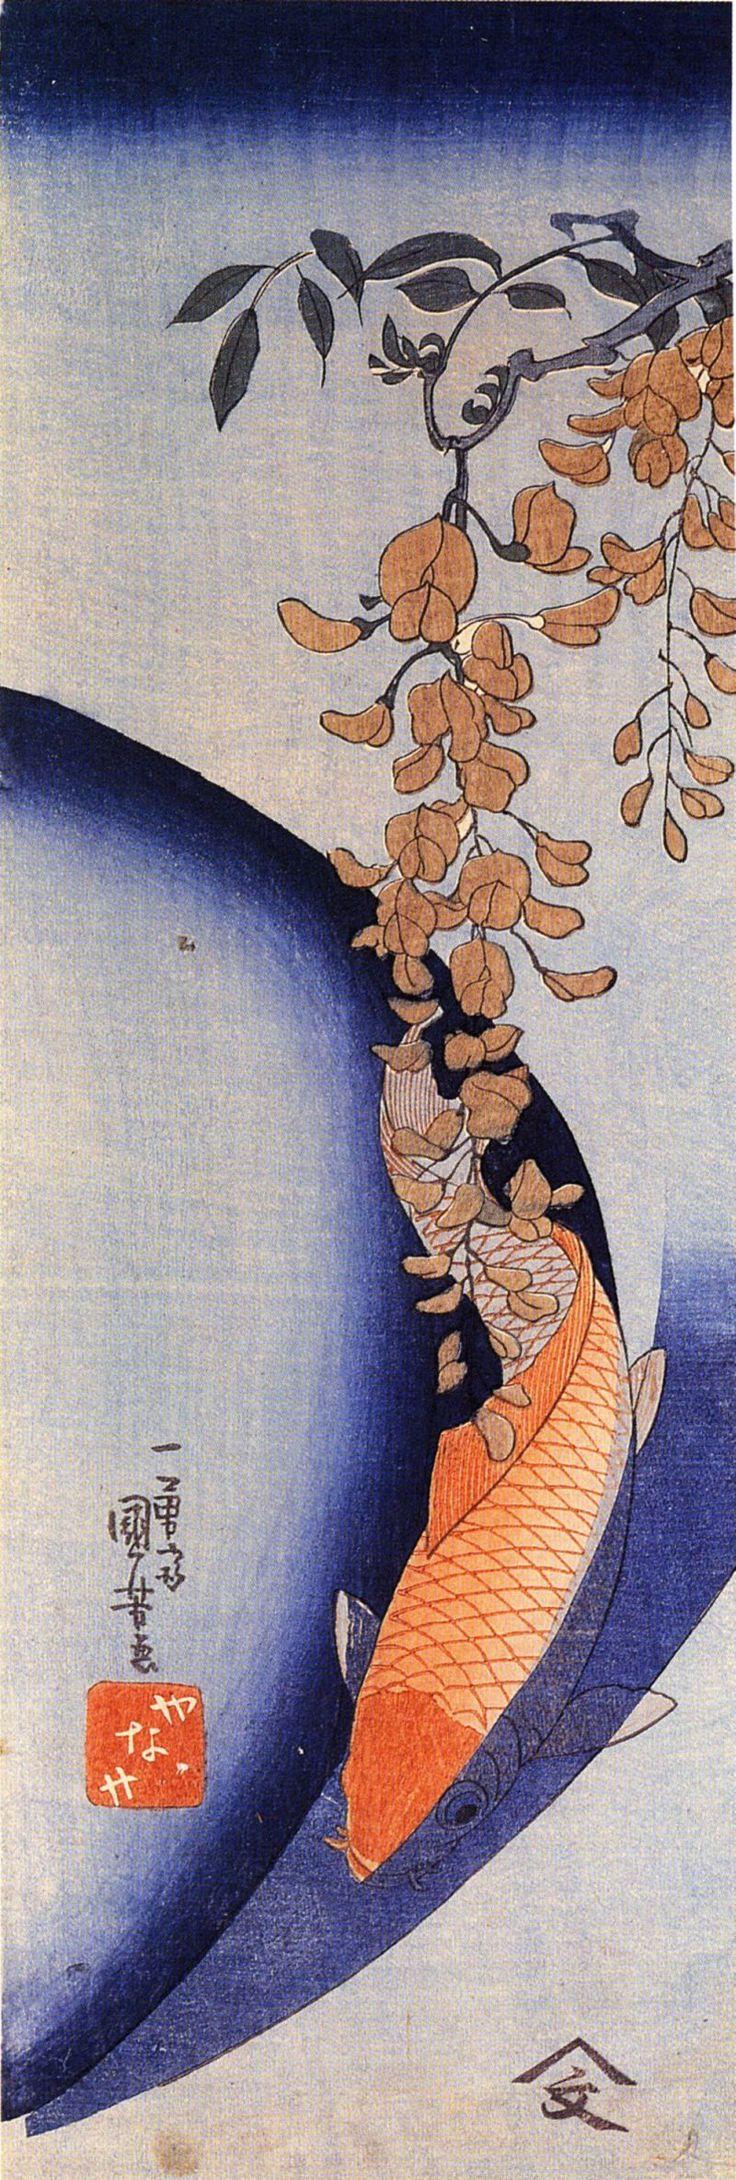 .:. Red Carp under Wisteria by Utagawa Kuniyoshi